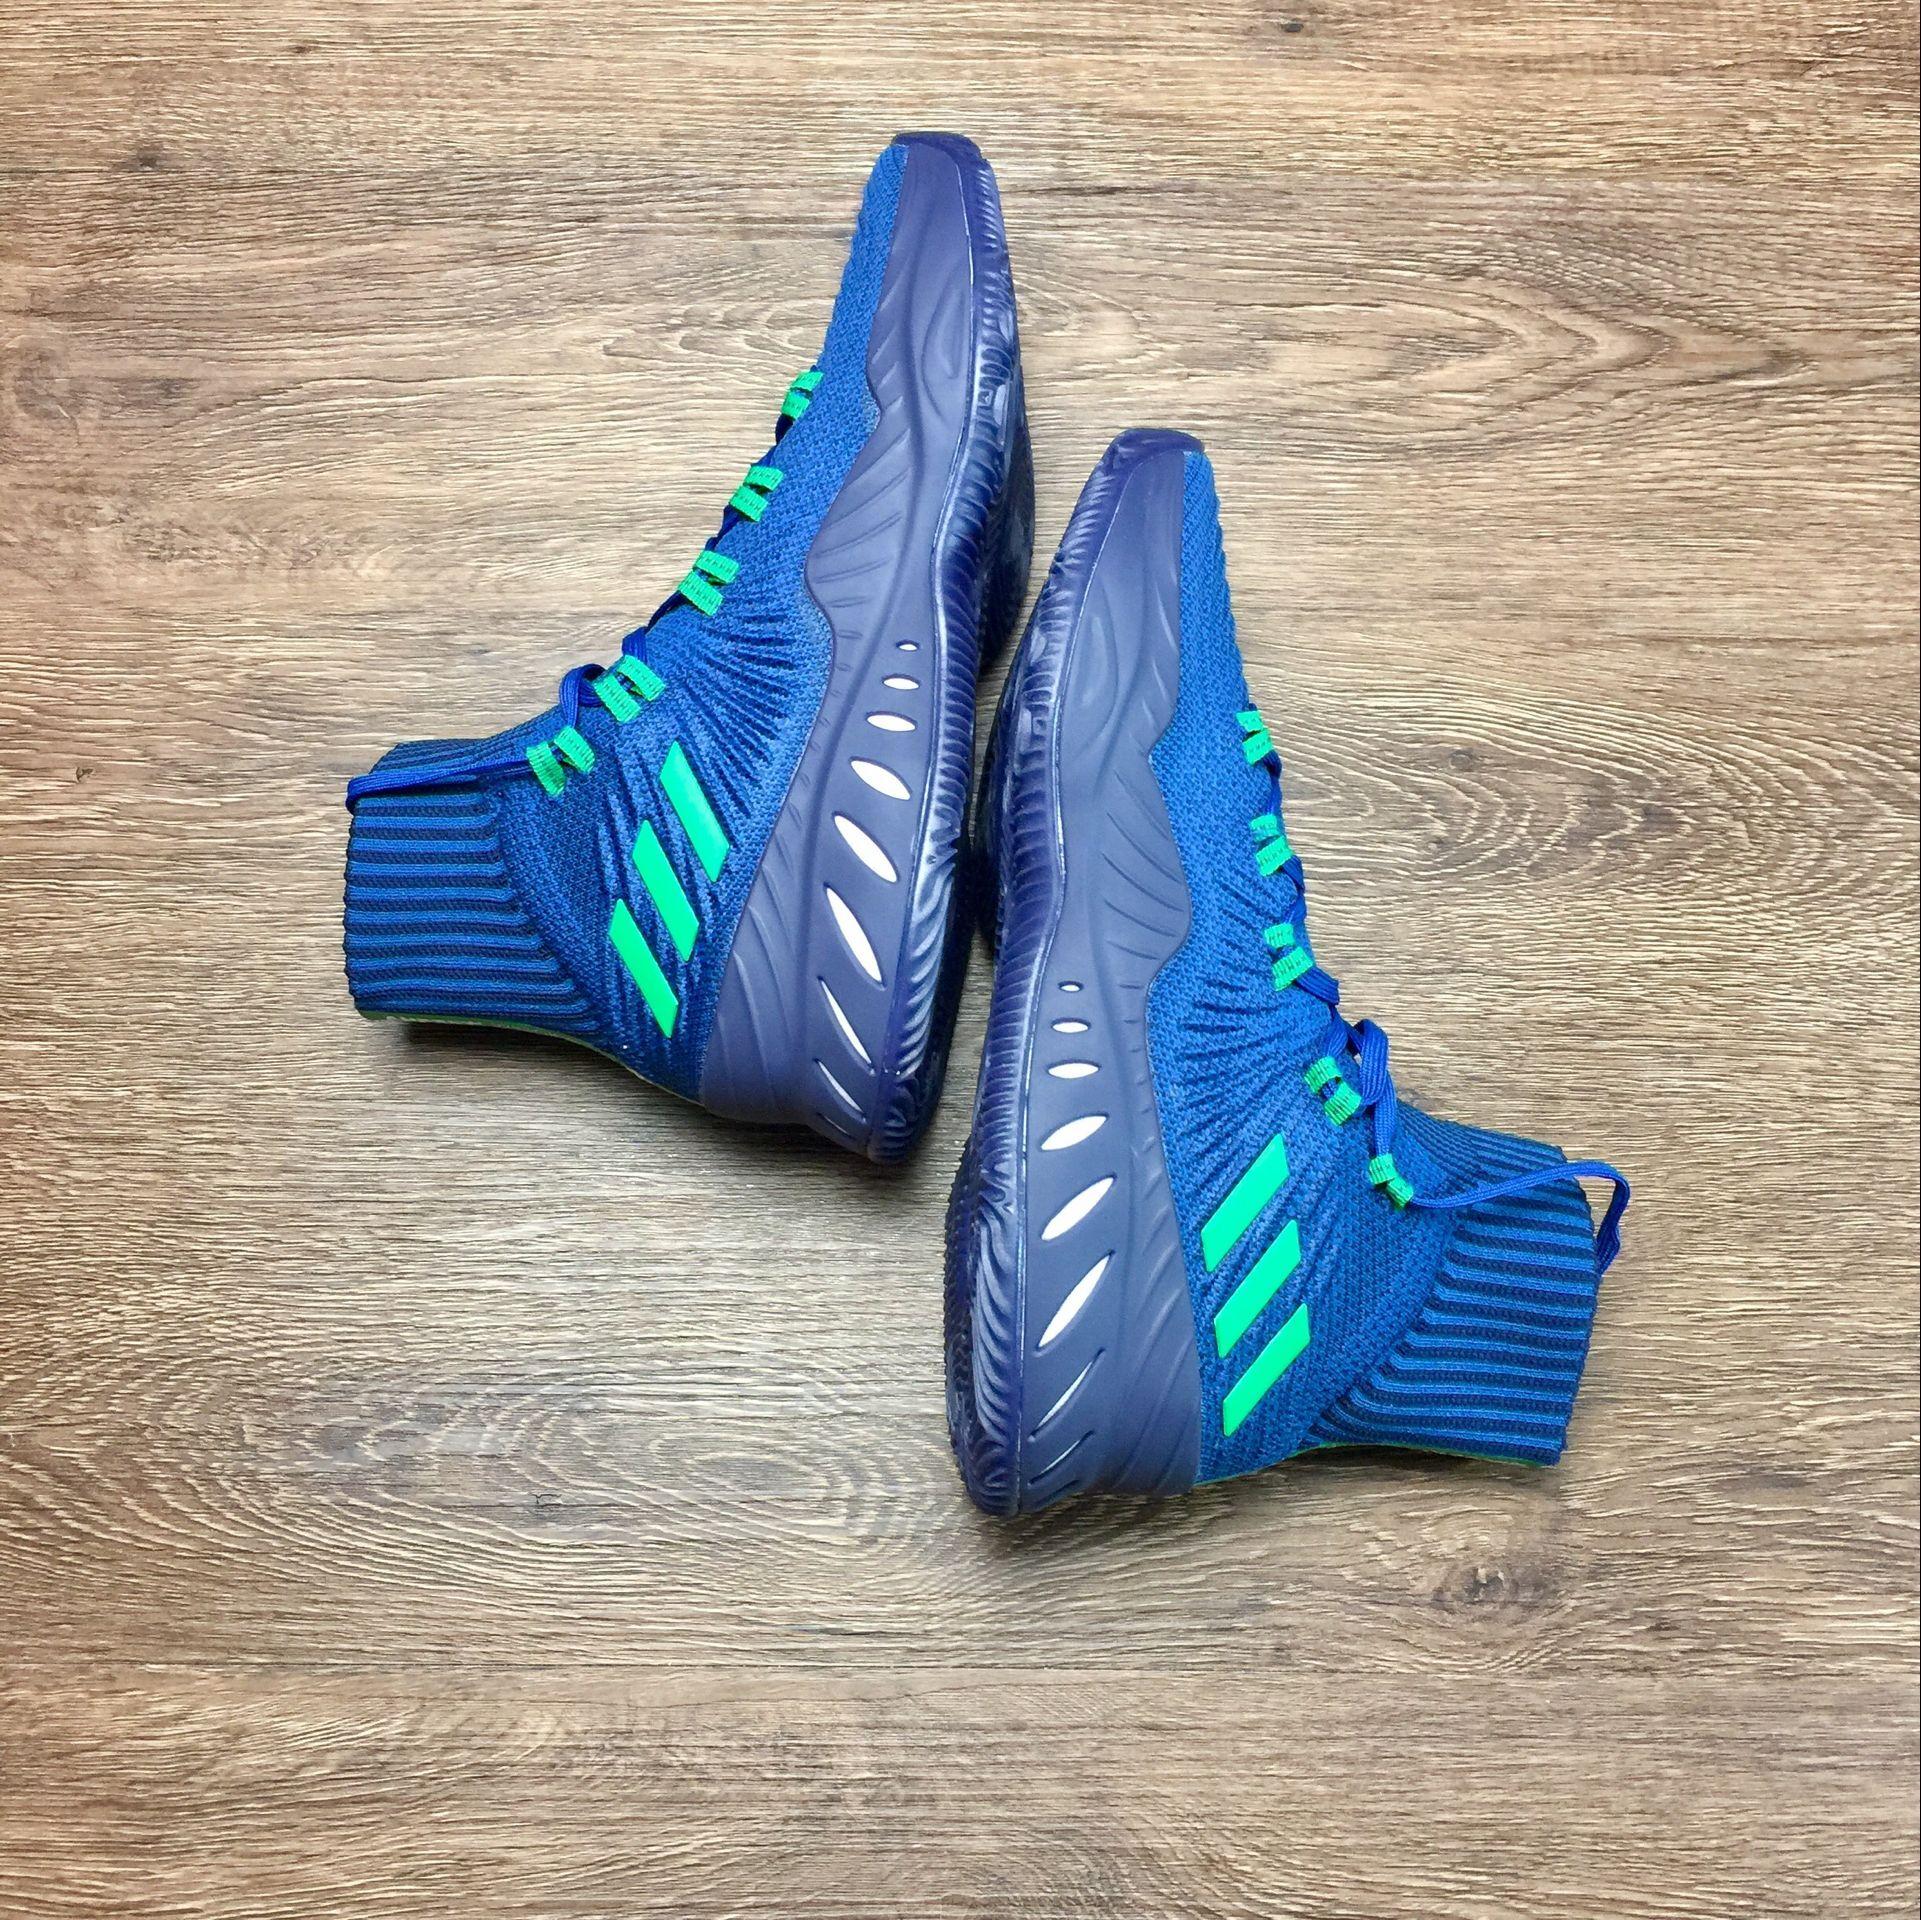 adidas crazy explosive 2017 aw 3